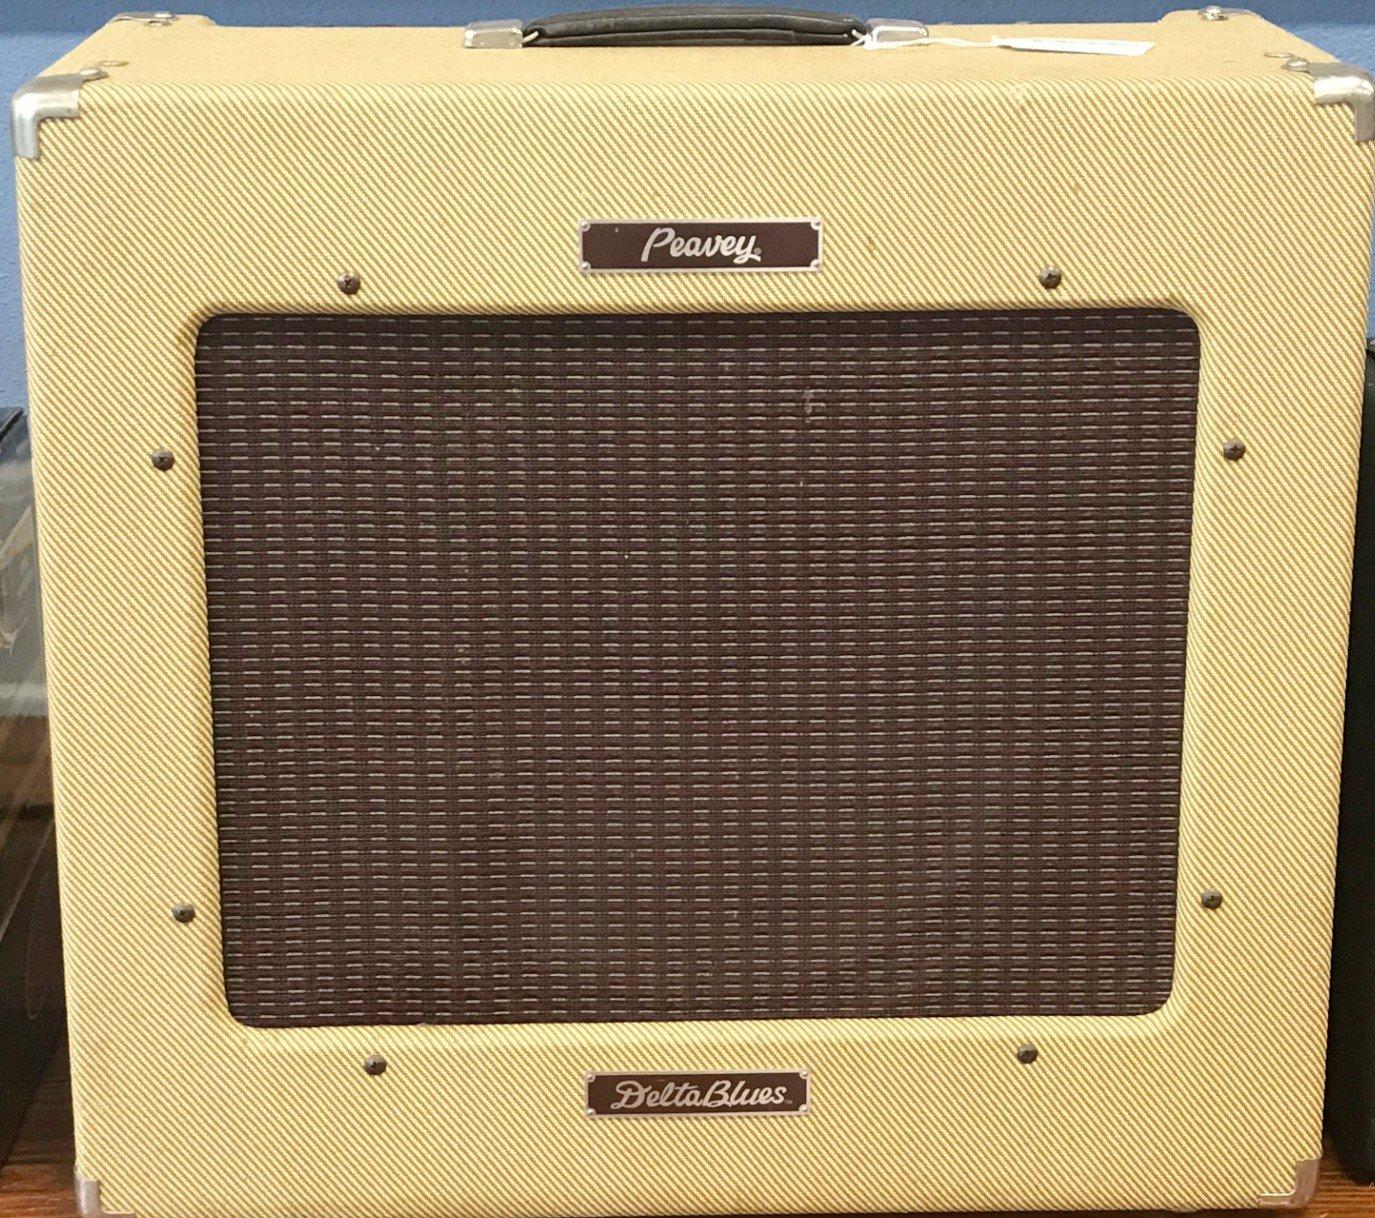 Peavey Delta Blues Tube Amp